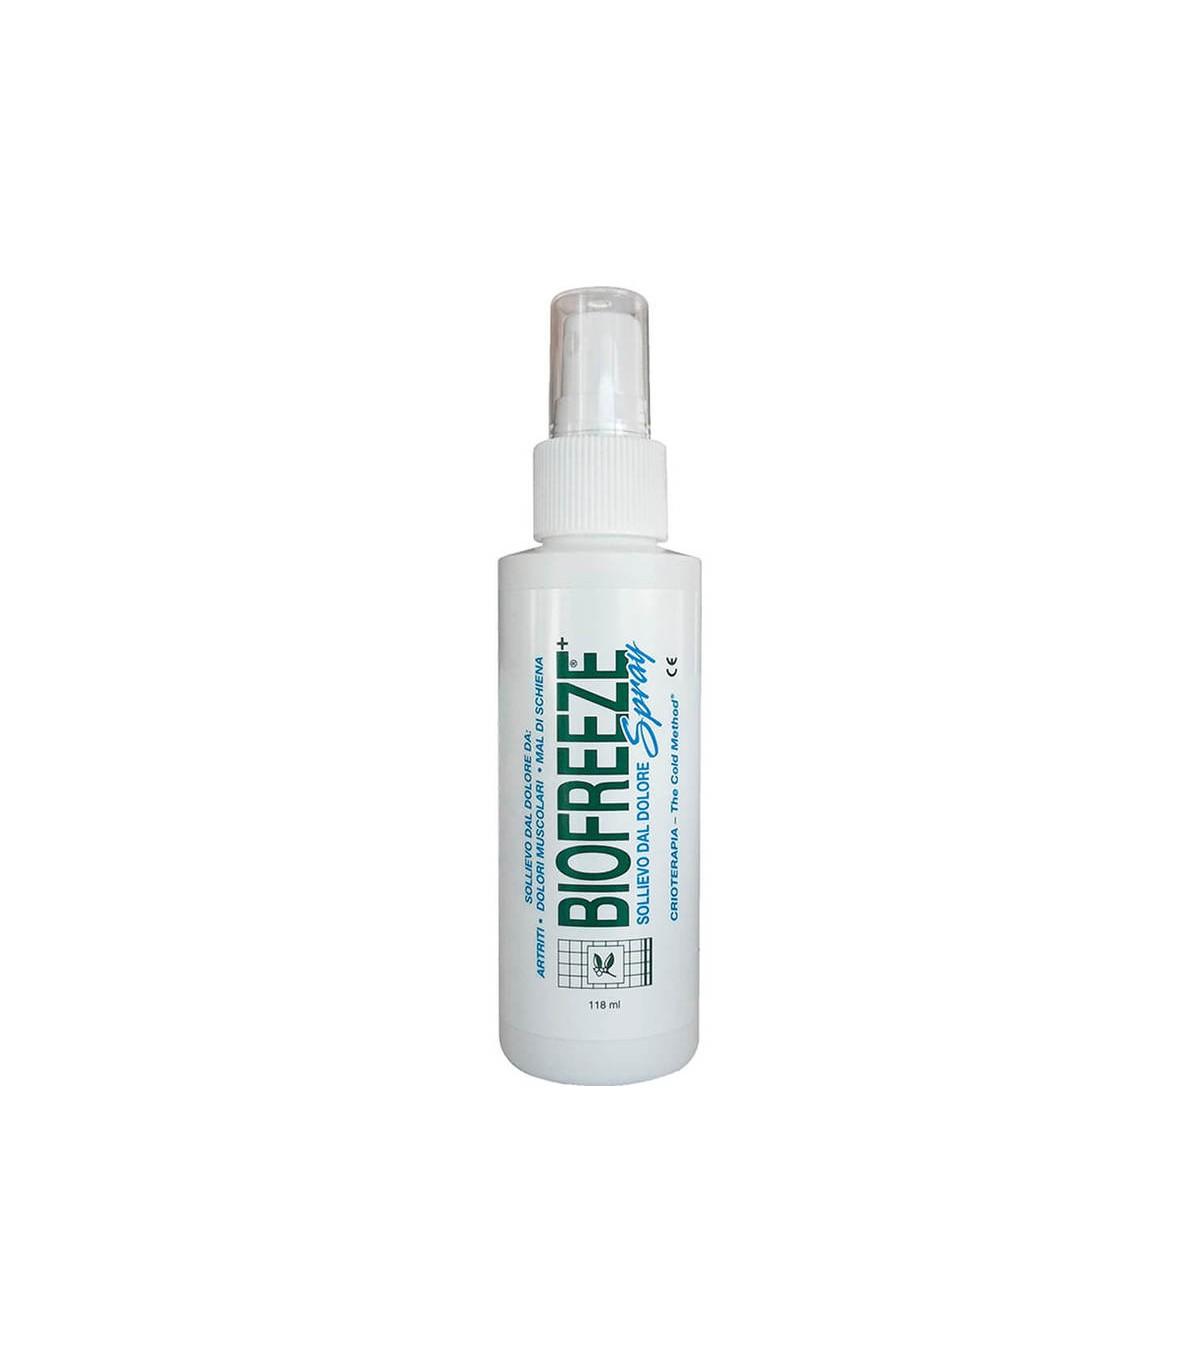 Salonpas Spray Antinfiammatorio ed Antidolorifico 120 ml